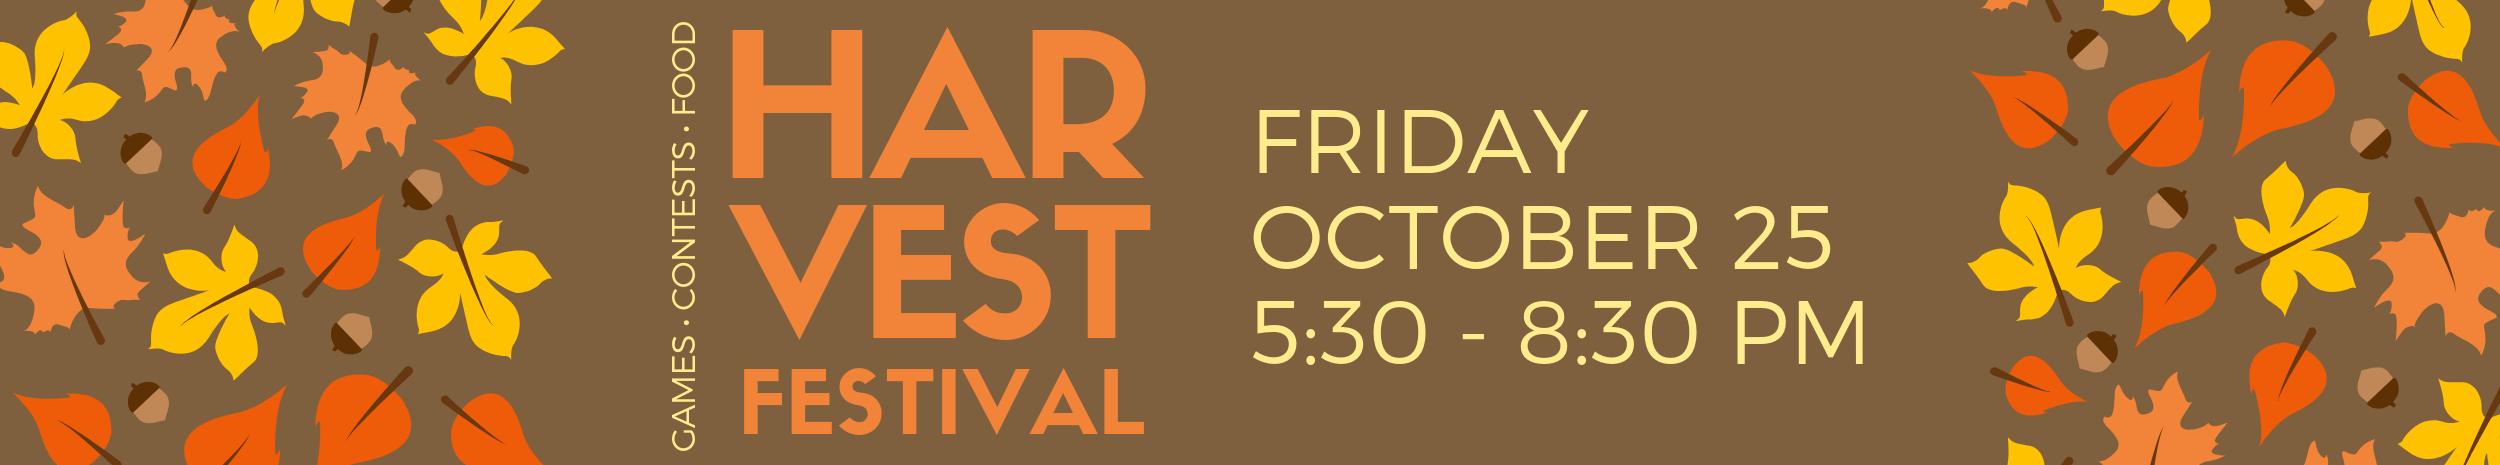 Join us Friday, October 25 for Harvest Fest